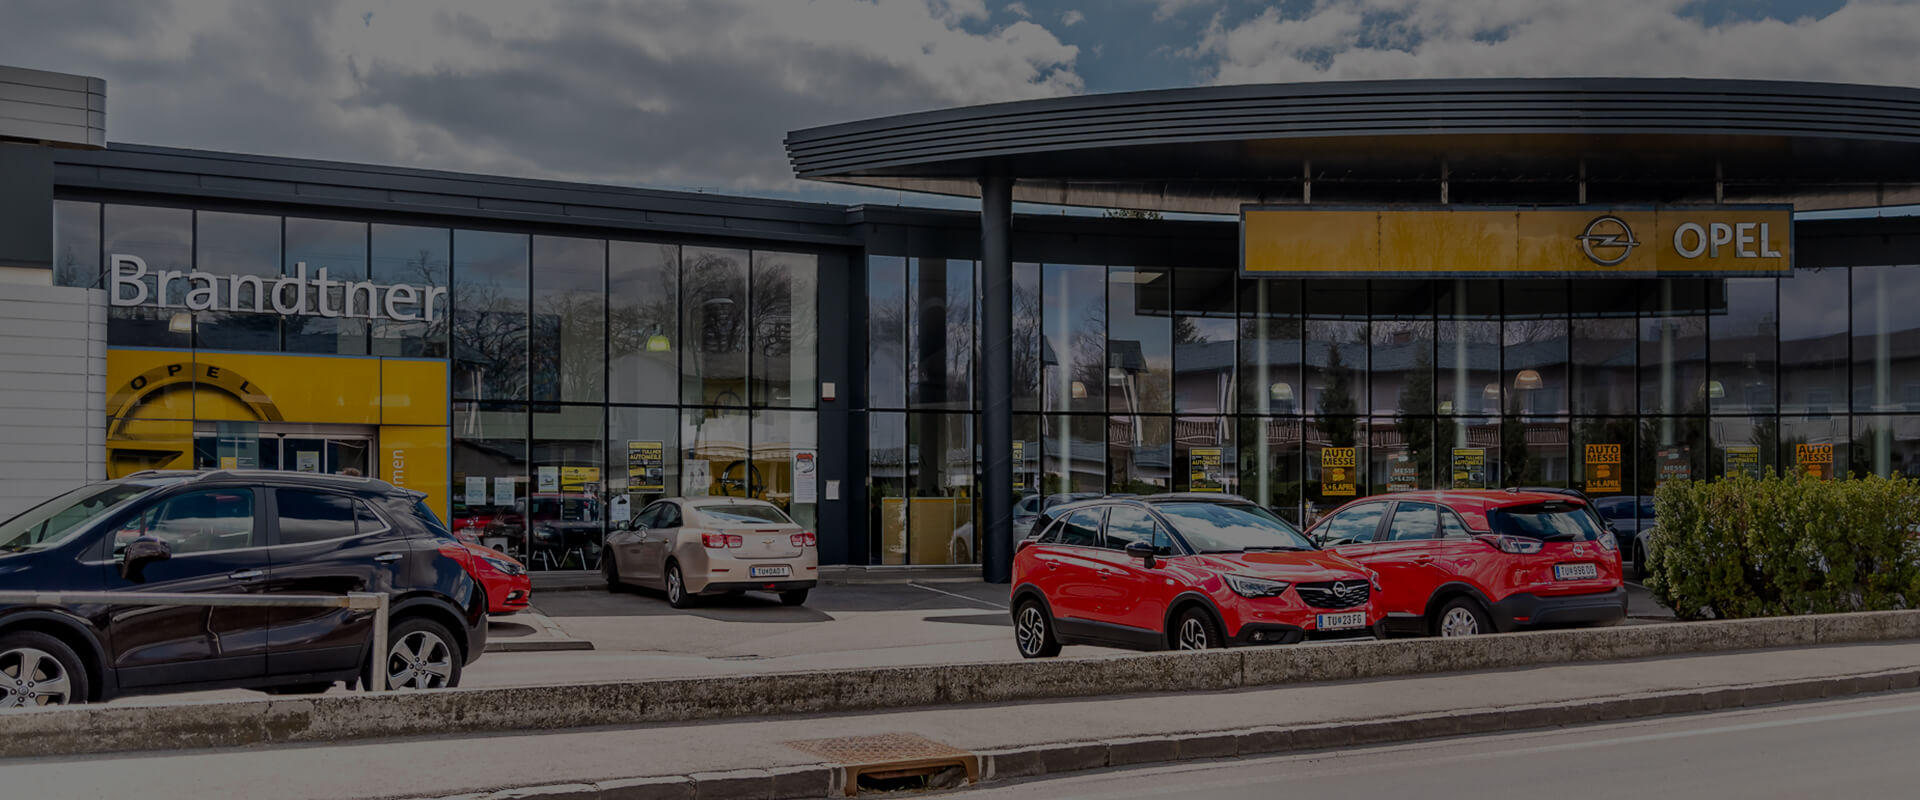 Autohaus Opel Brandtner